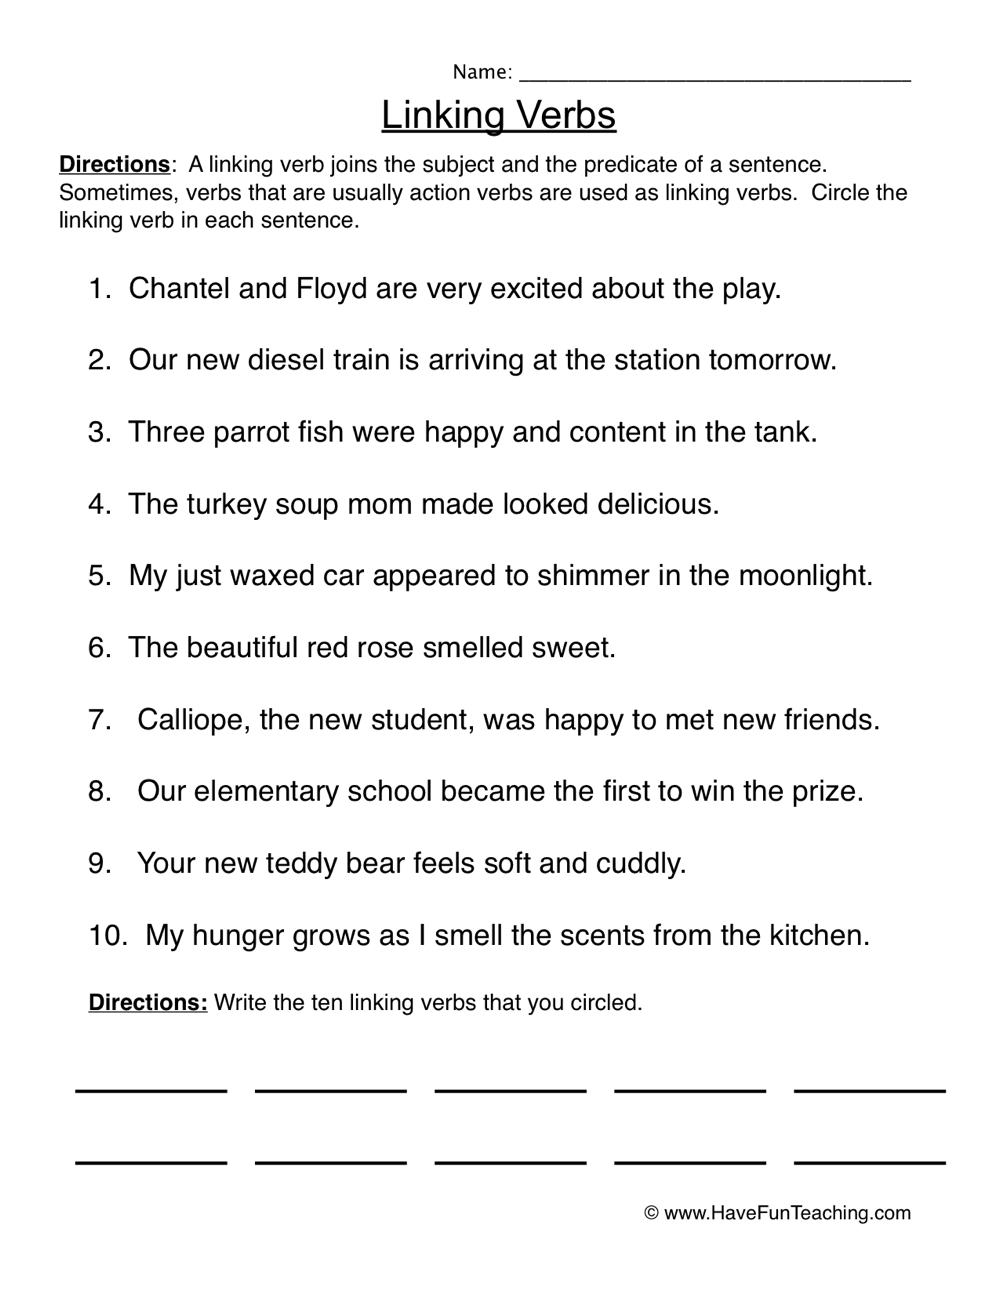 Locating Linking Verbs Worksheet | Have Fun Teaching